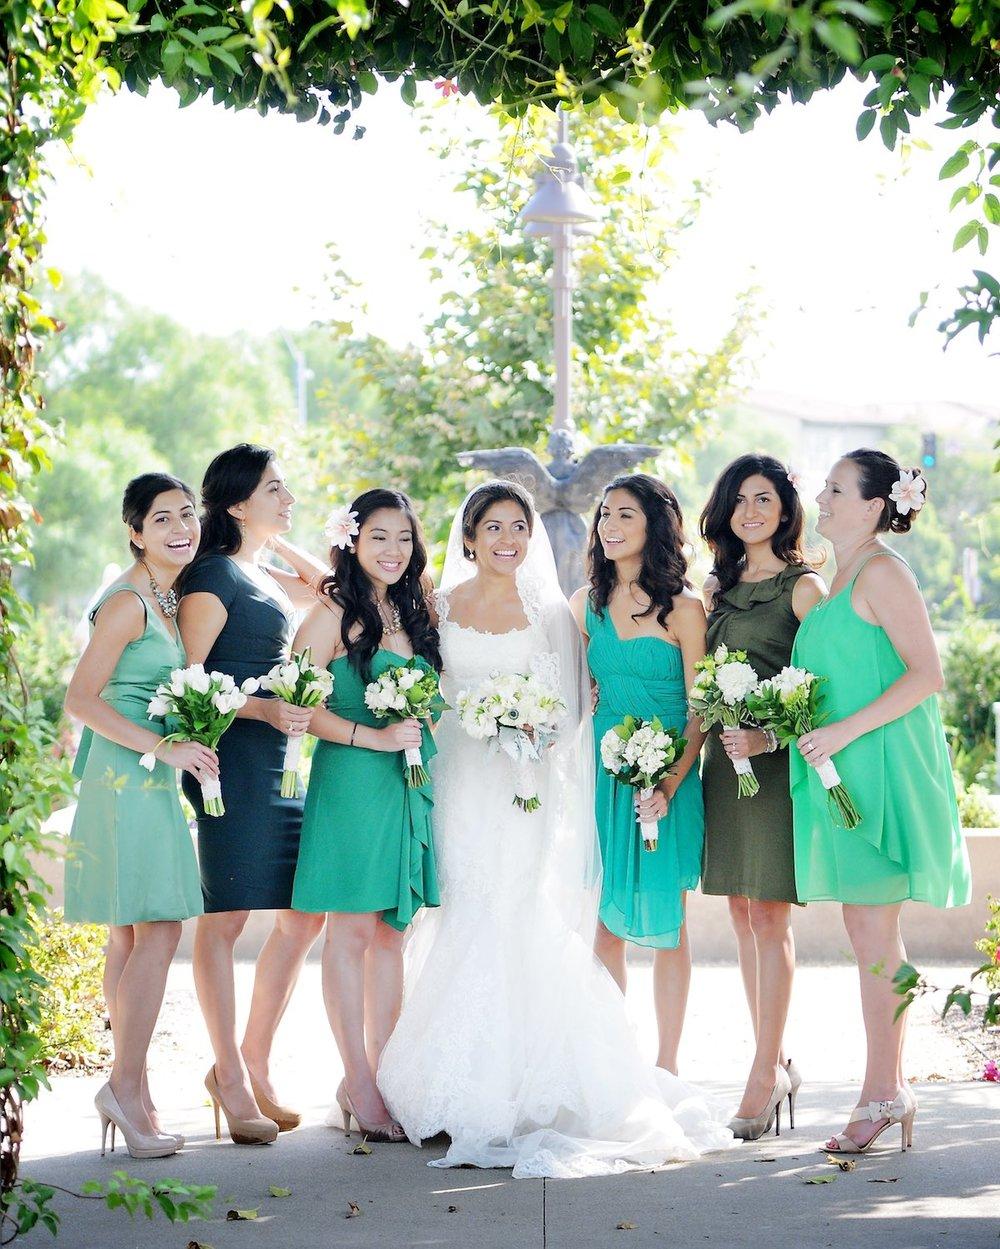 irvine-wedding-michal-pfeil-16.jpg